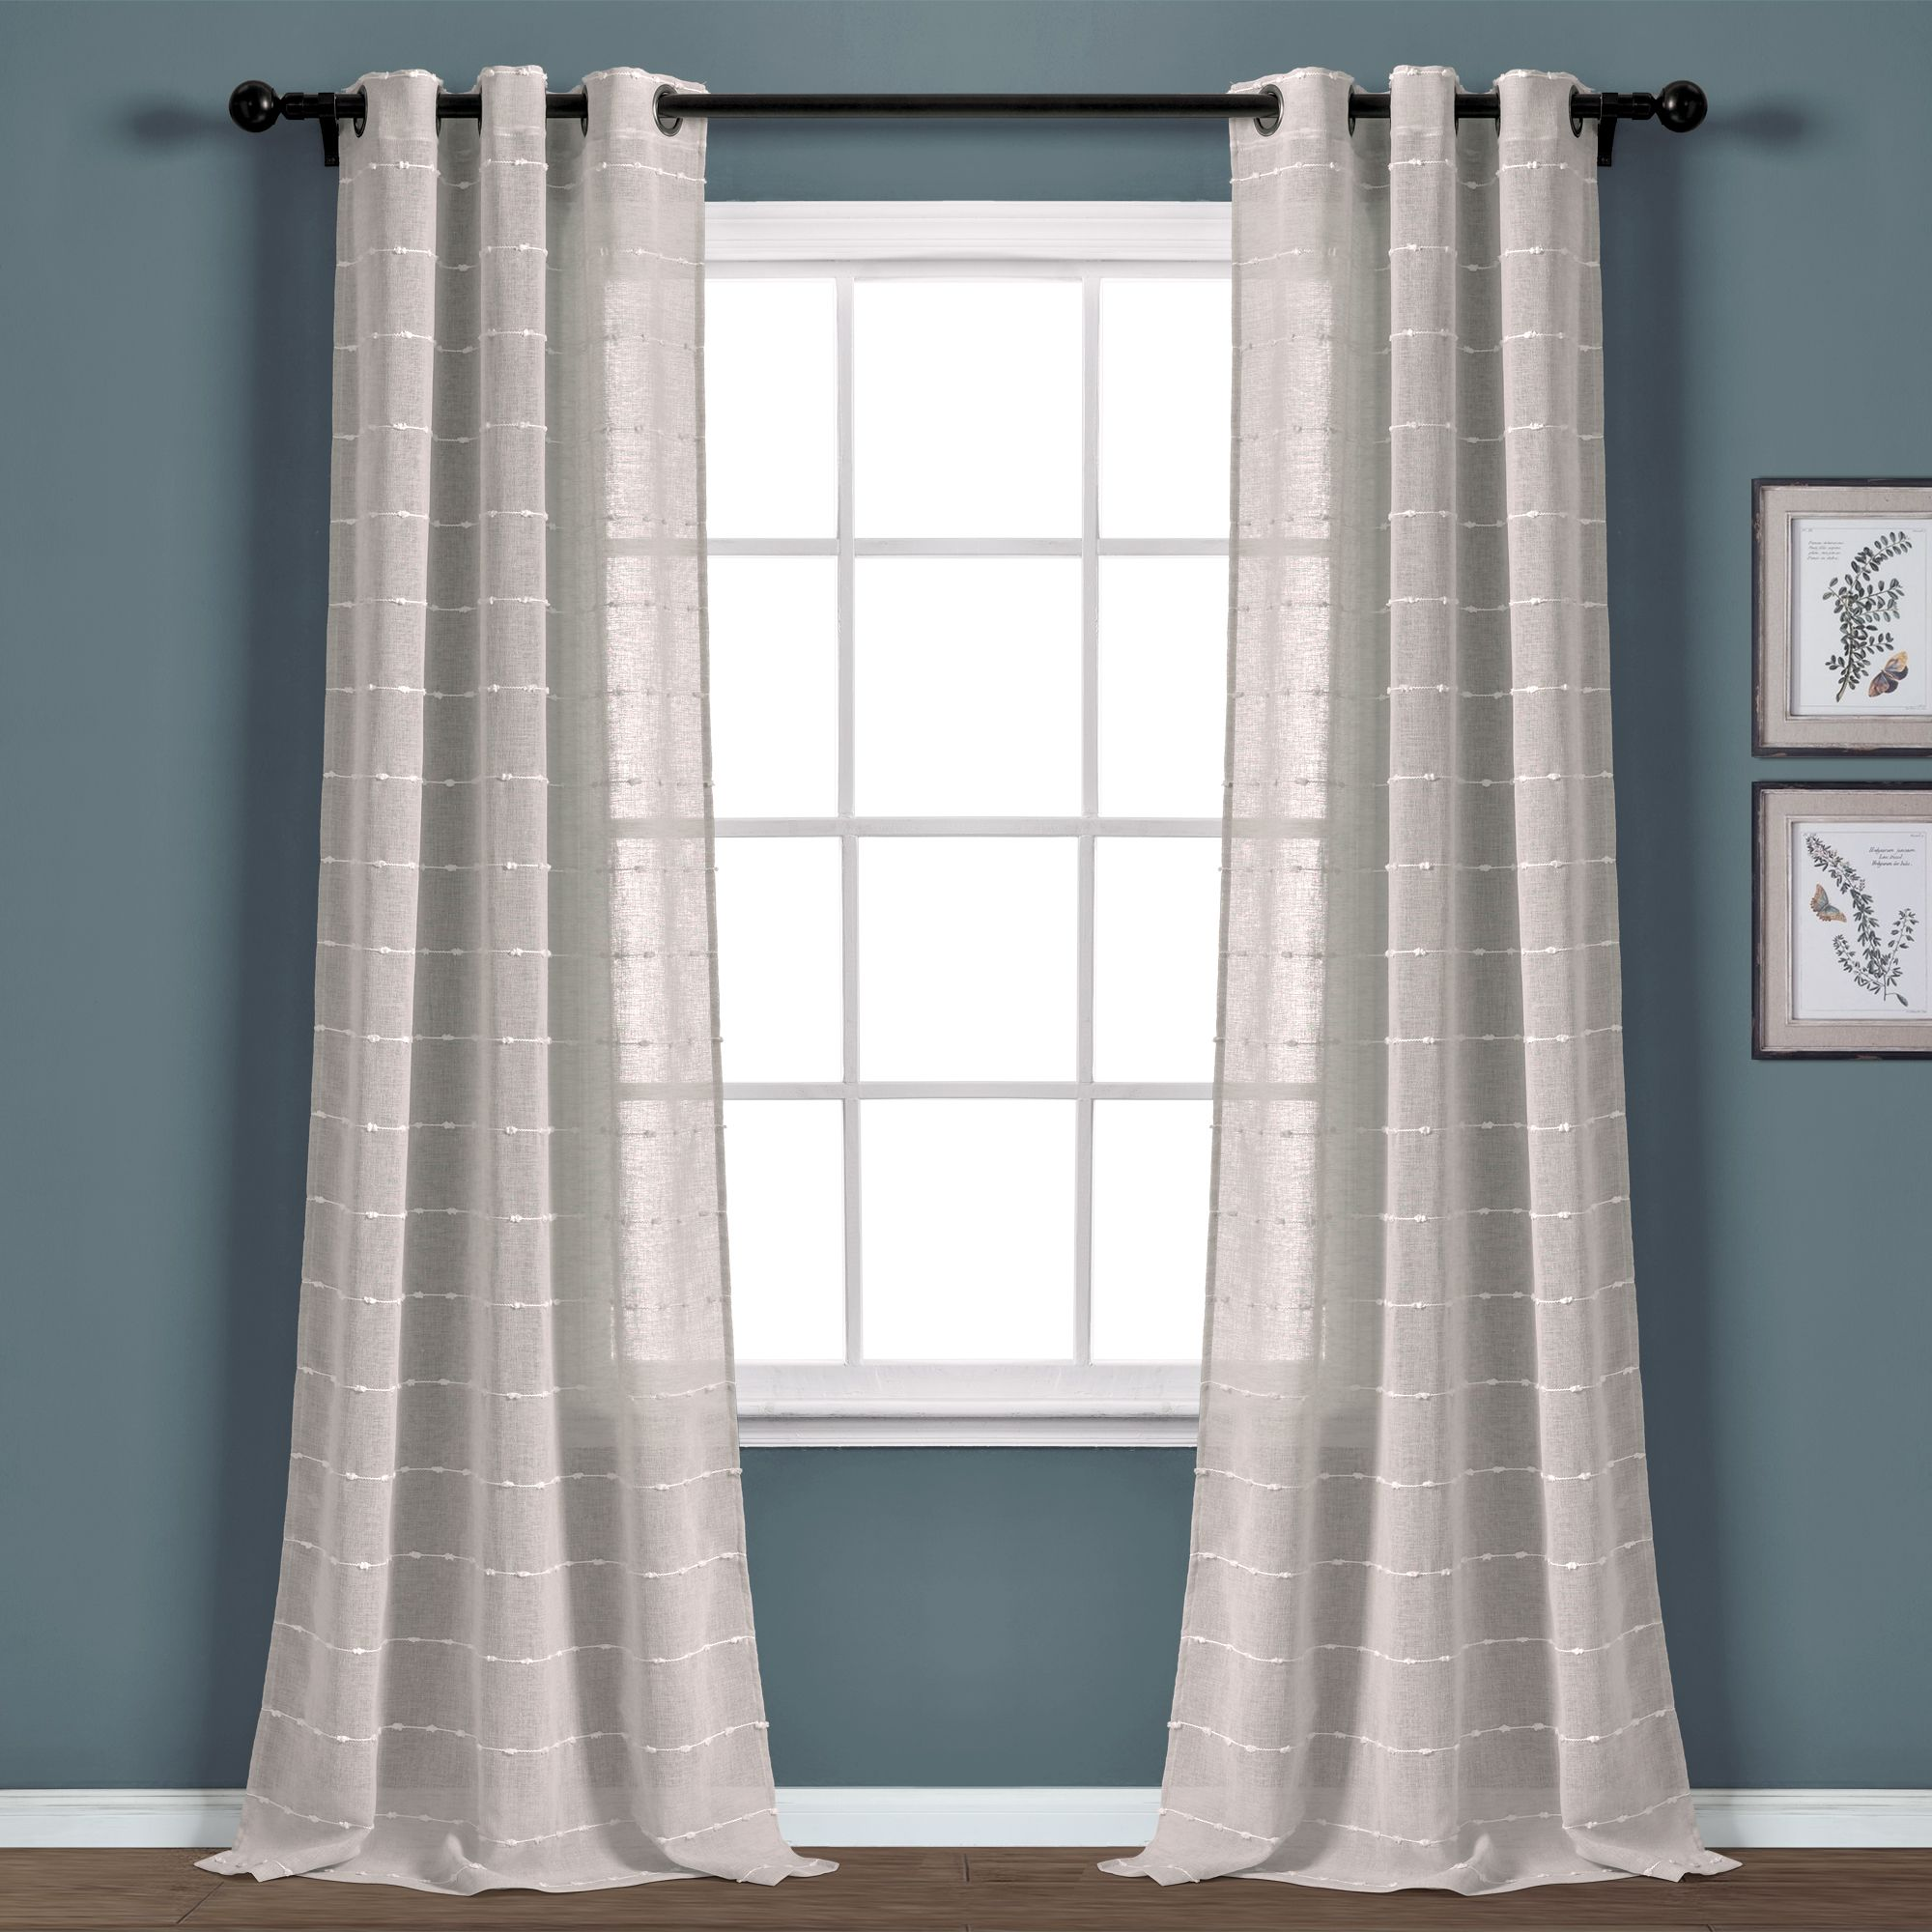 Farmhouse Textured Grommet Sheer Window Curtain Panel Set In 2020